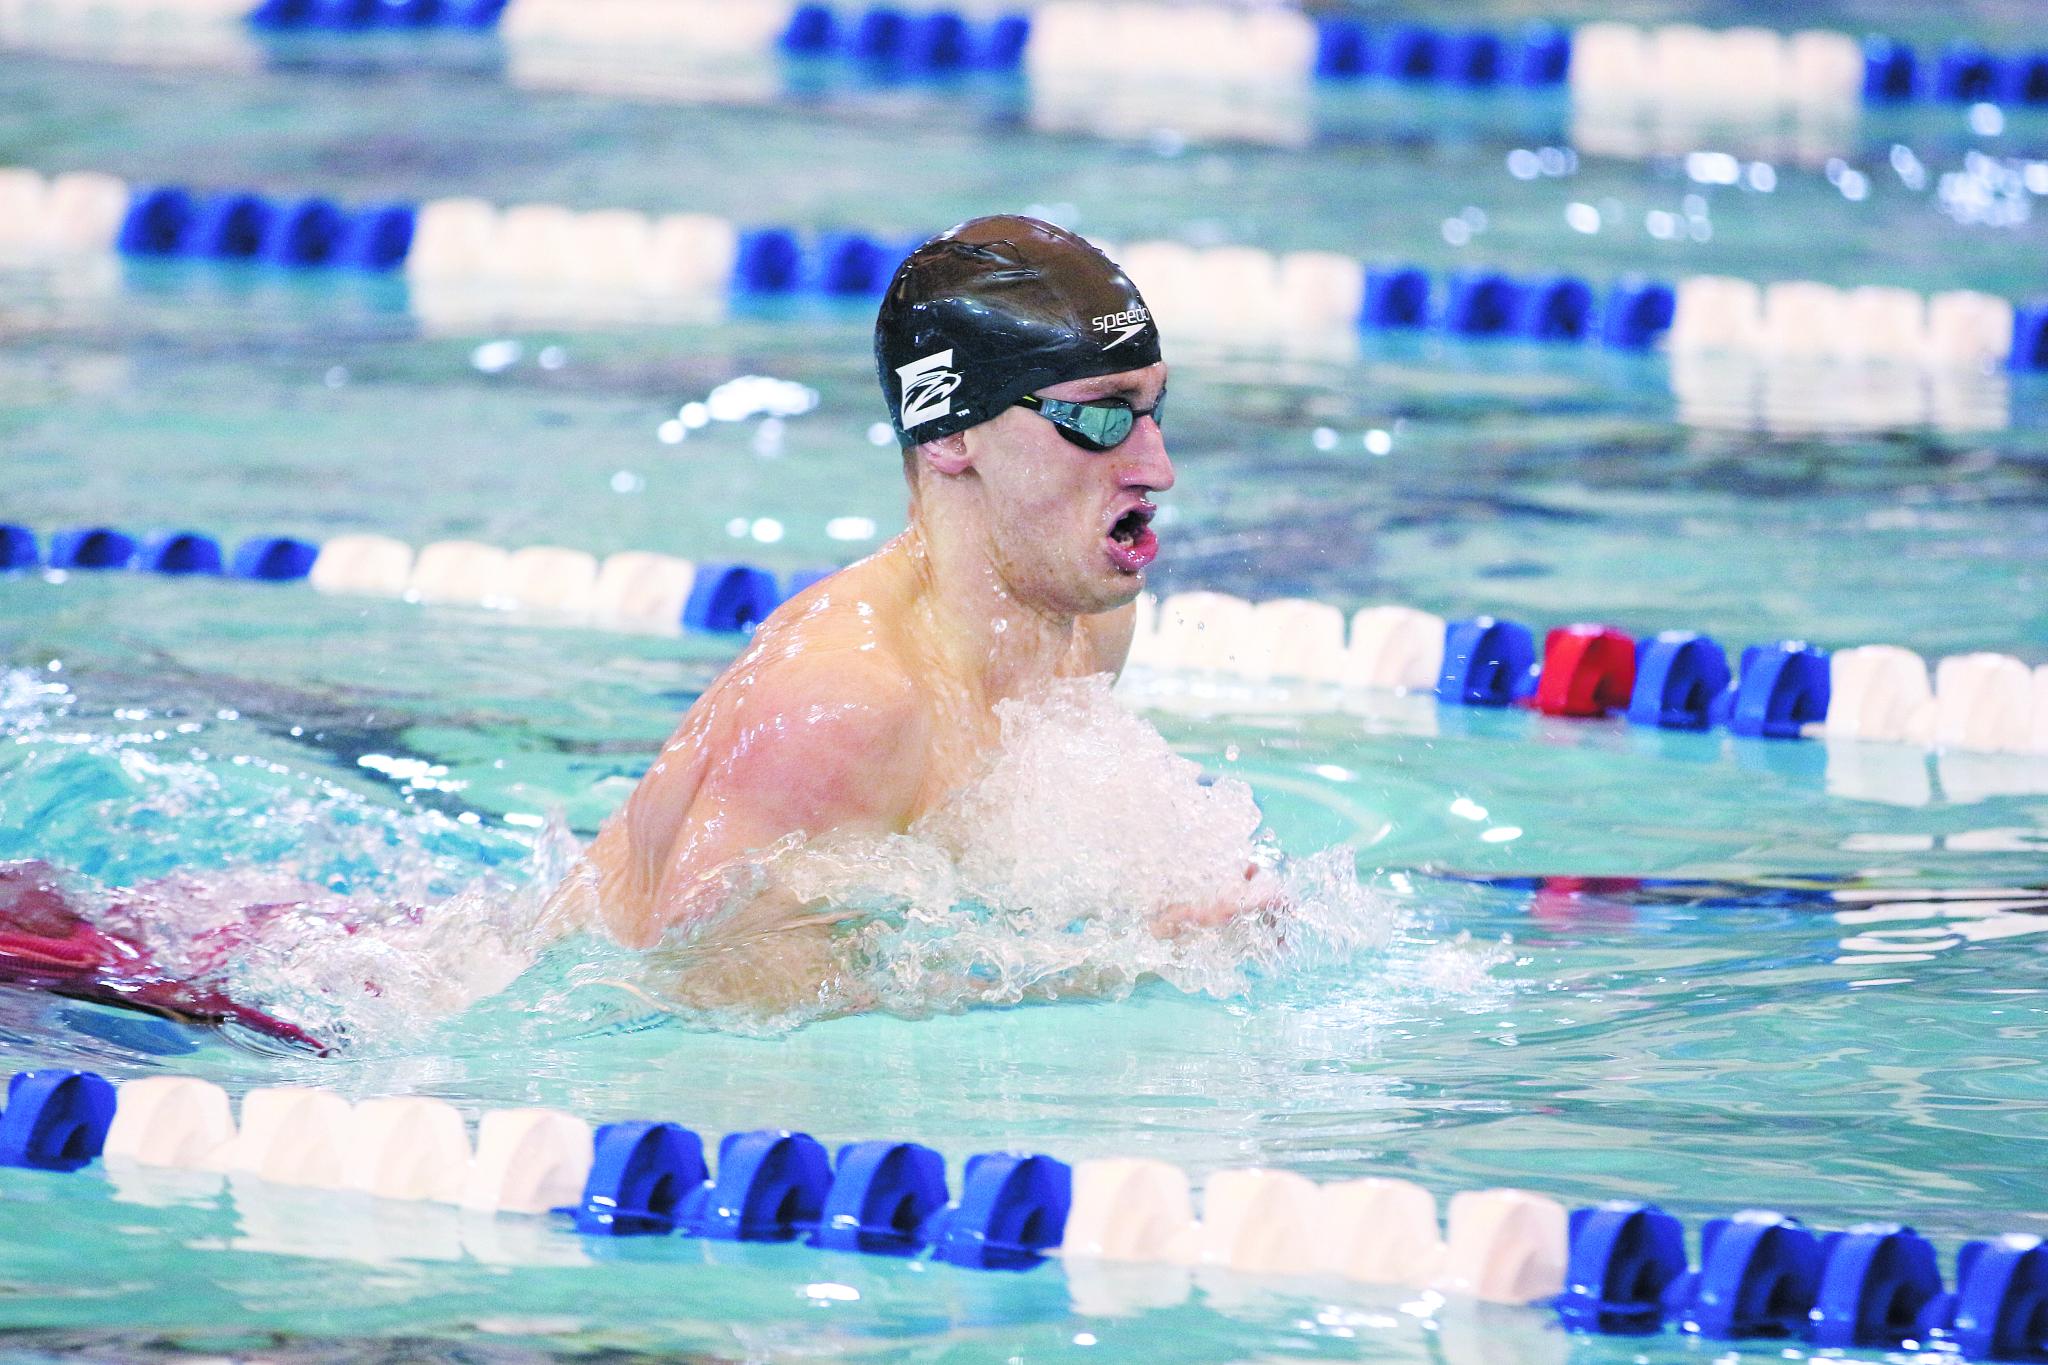 Swimming: Quah Zheng Wen wins first individual NCAA medal